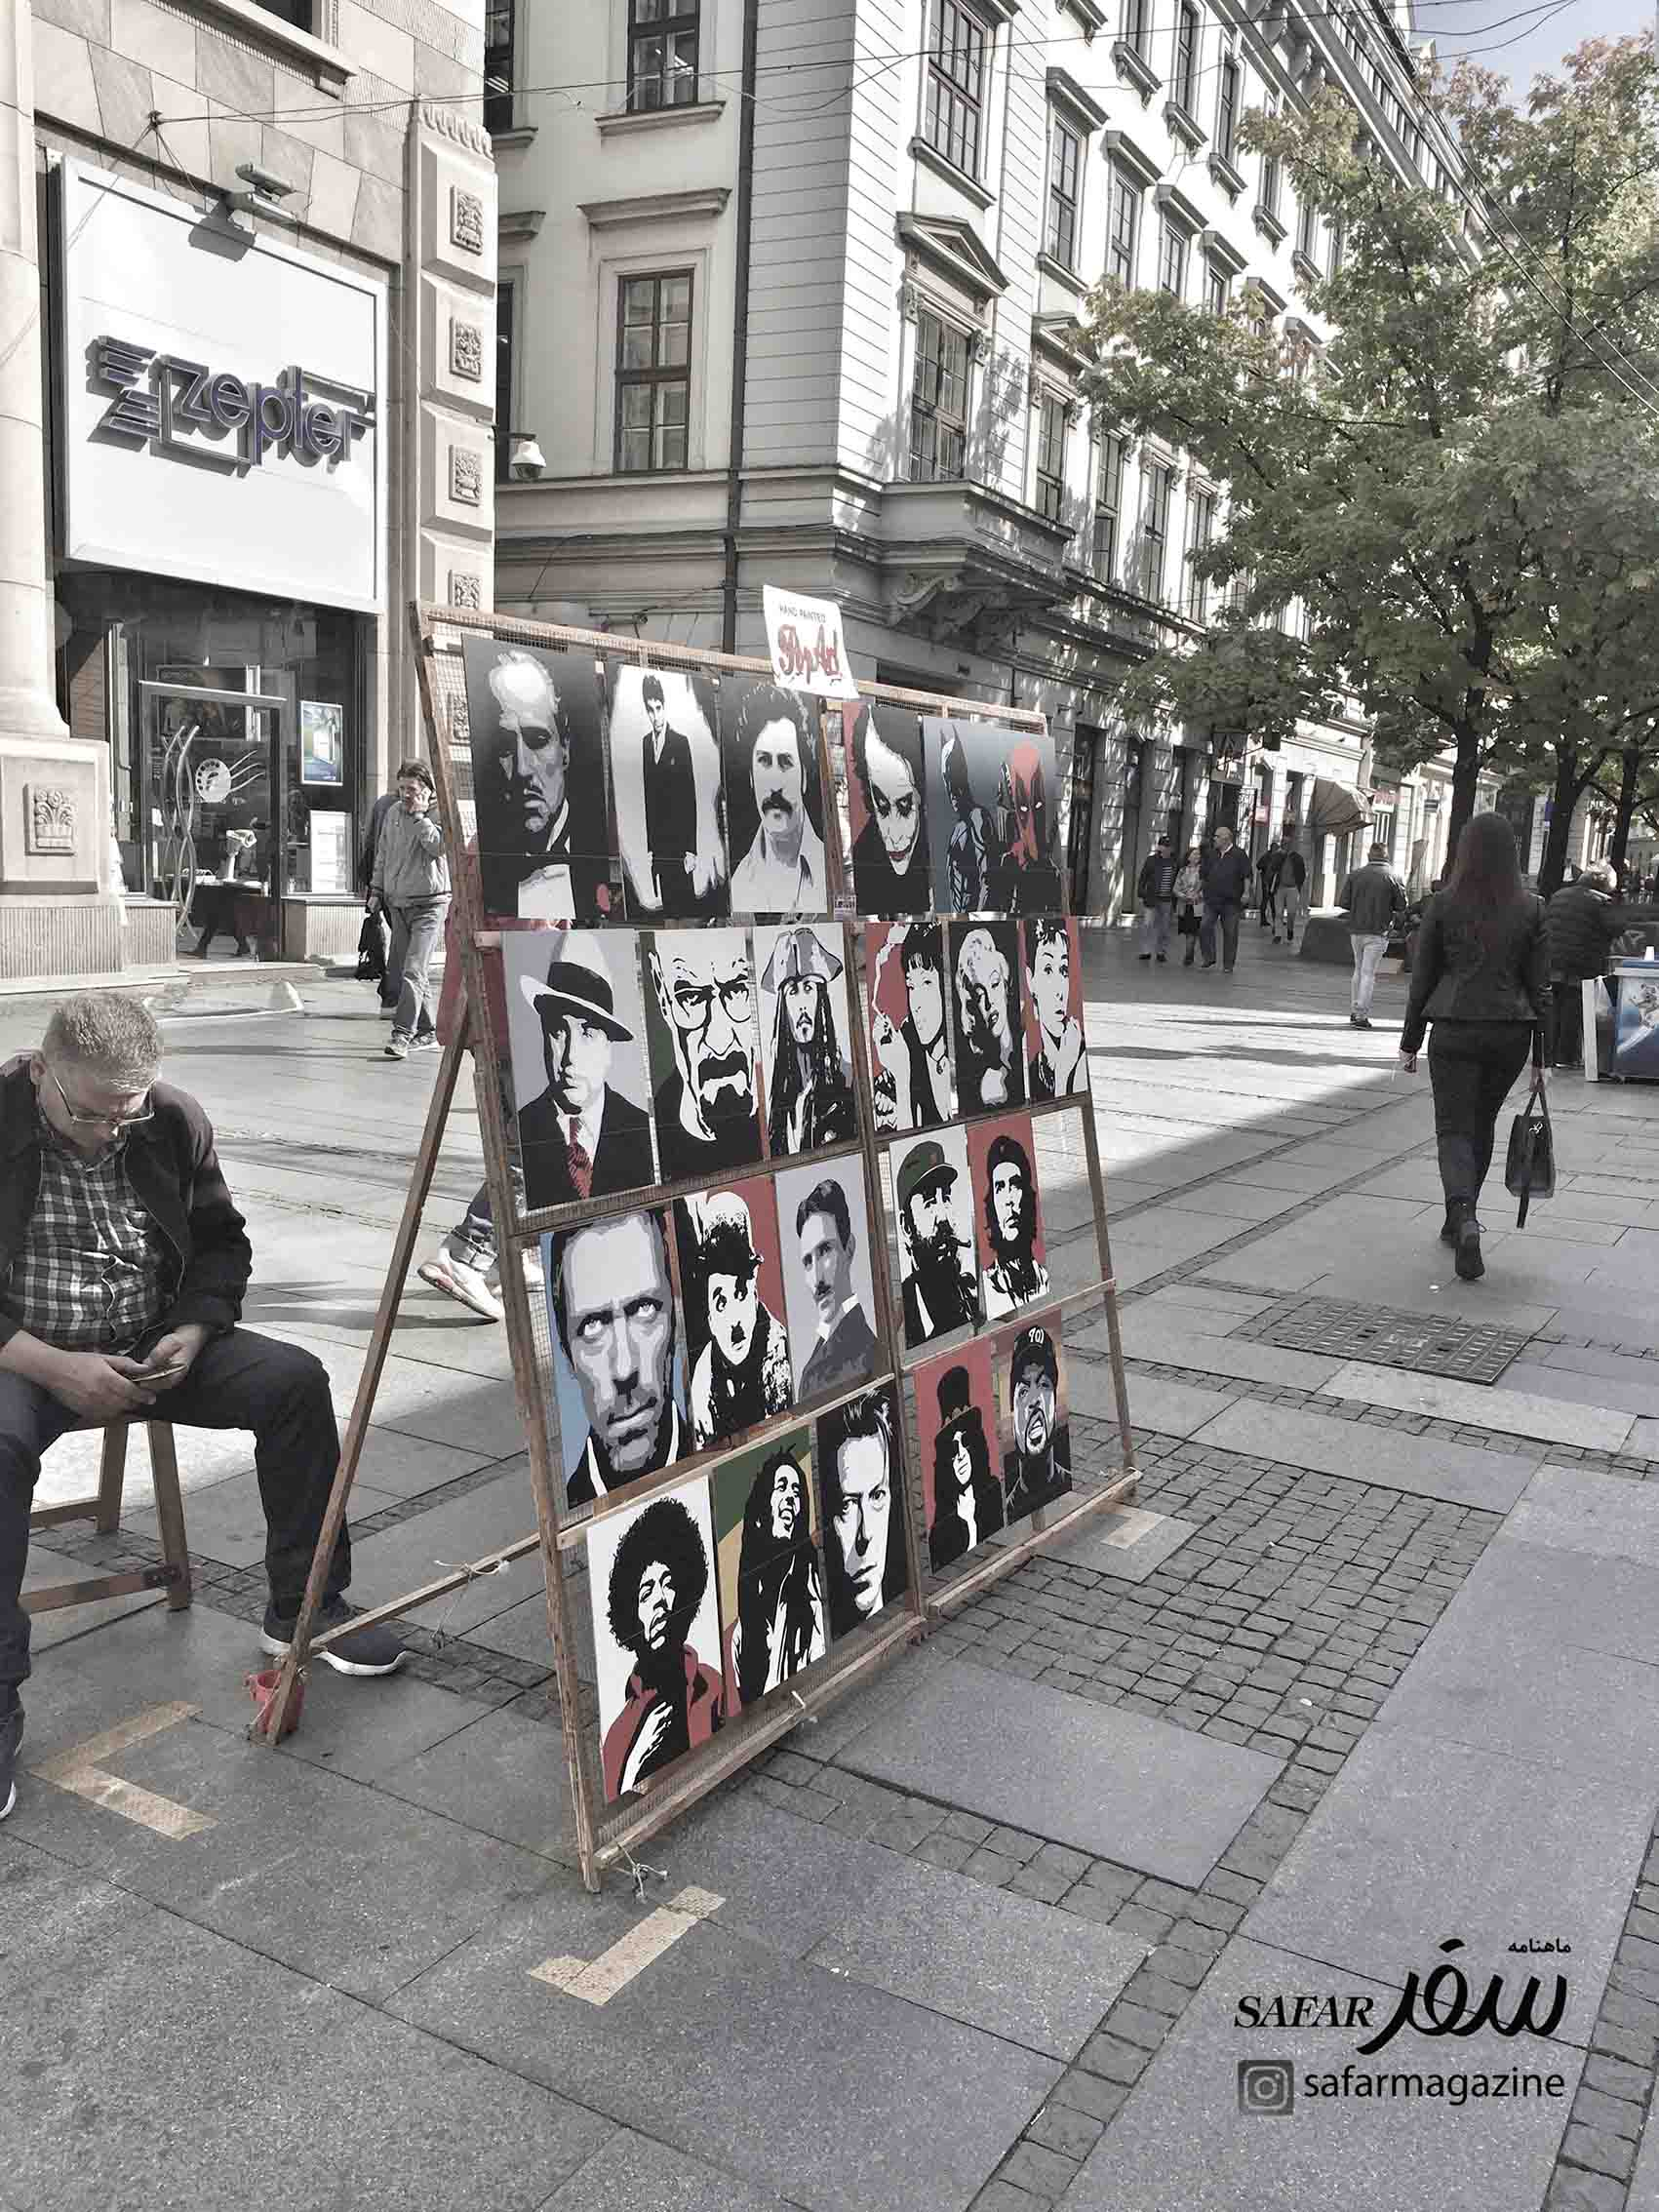 خیابان کنز میخایلو- صربستان